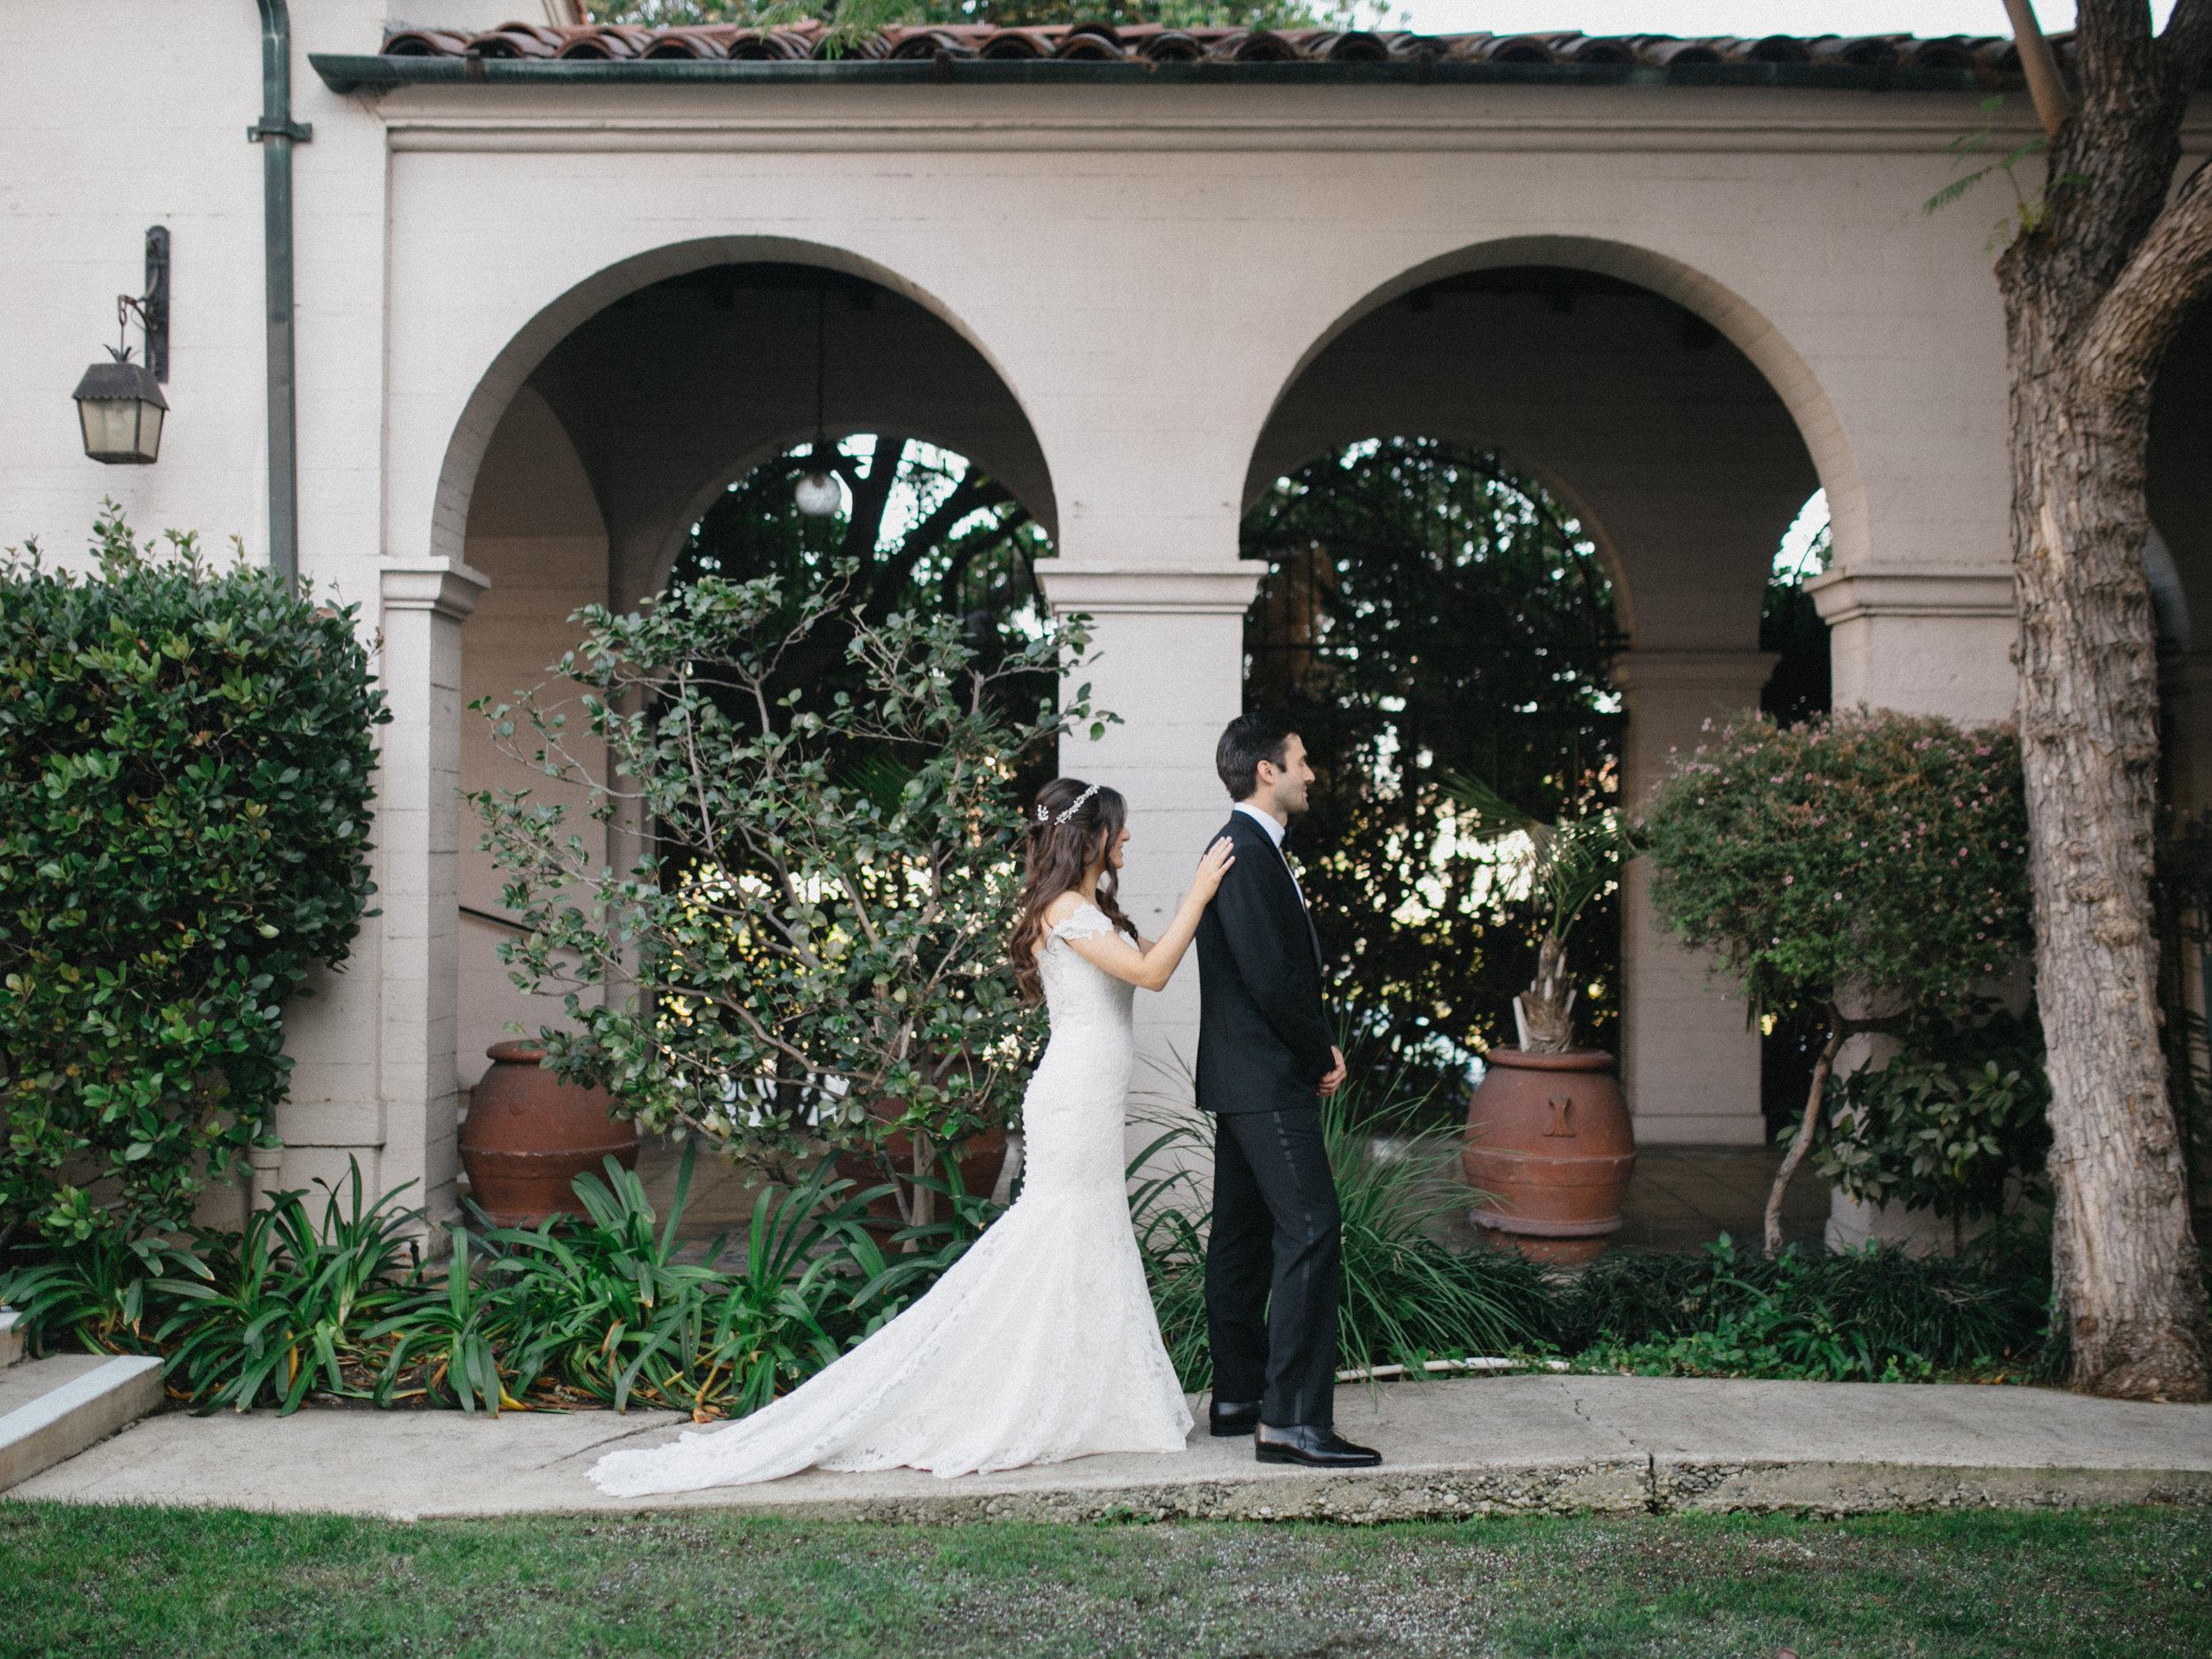 Jessica and Robert Wedding Photos-092.jpg